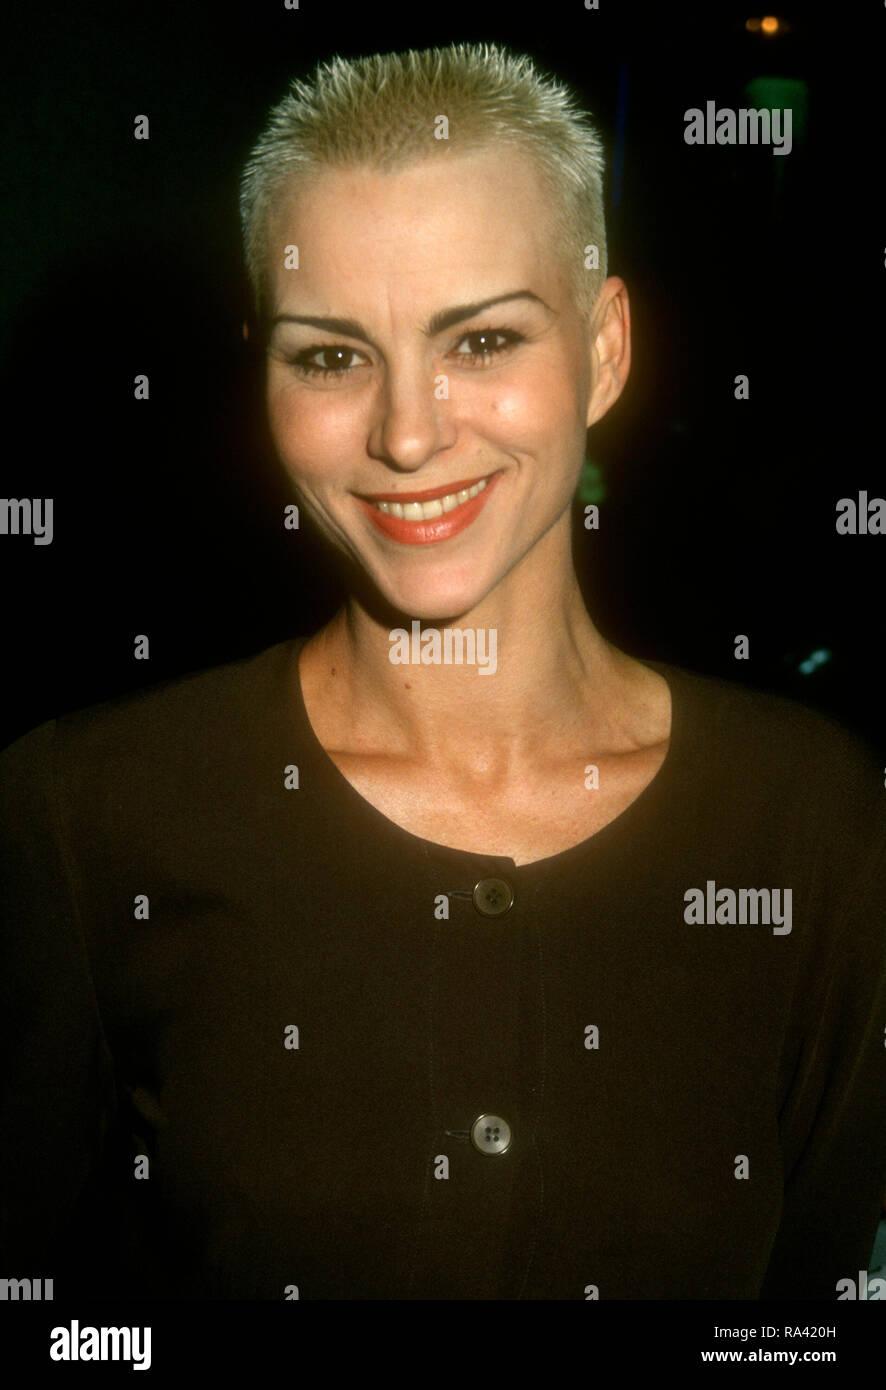 Emma Rigby (born 1989),Kimberly-Rose Wolter Sex gallery Maria del Mar,Padma Vasanthi